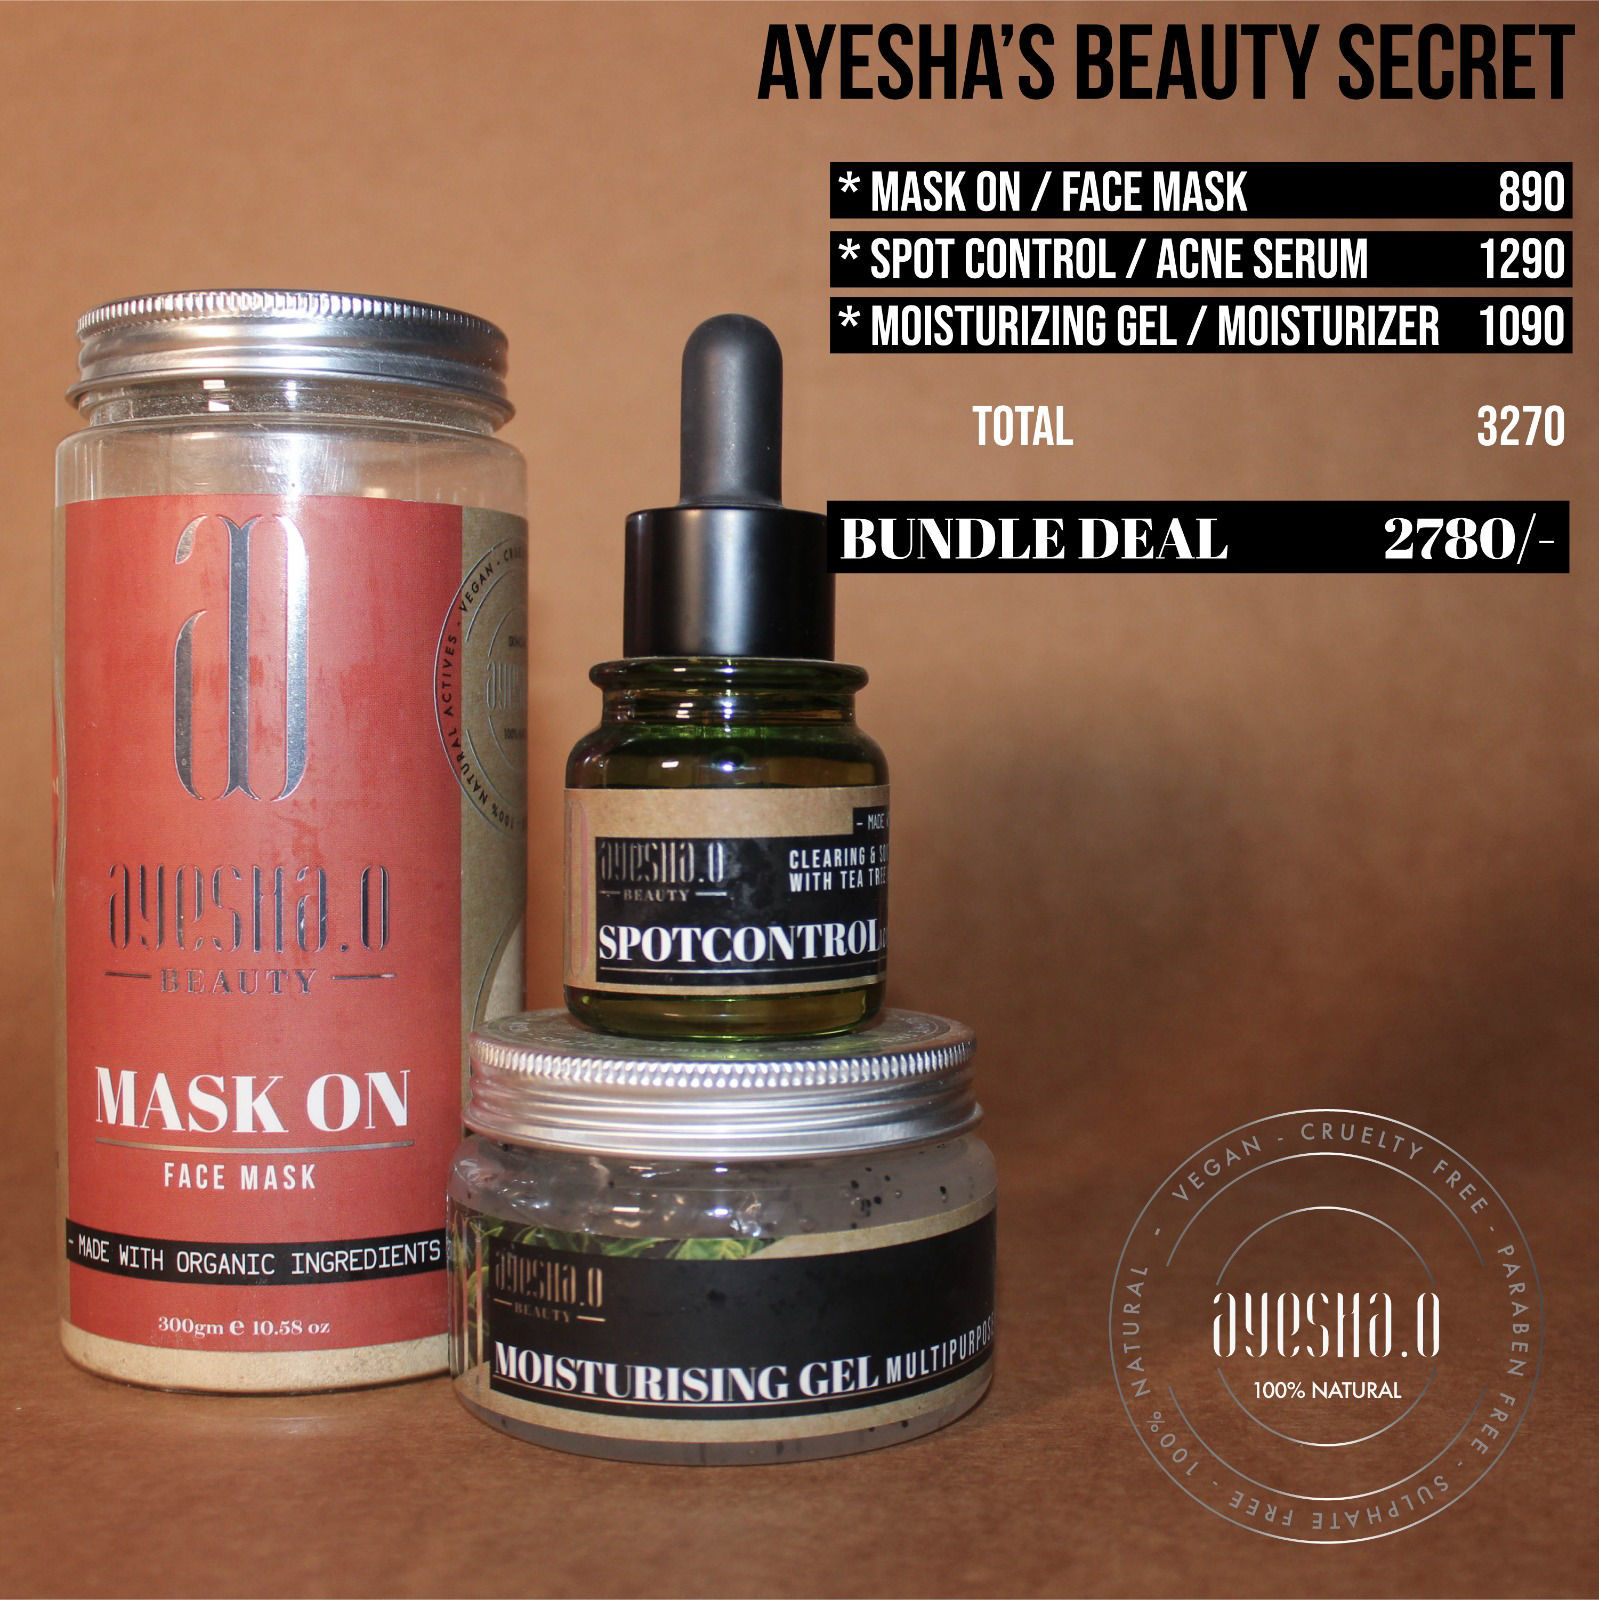 Ayesha's Beauty Secret